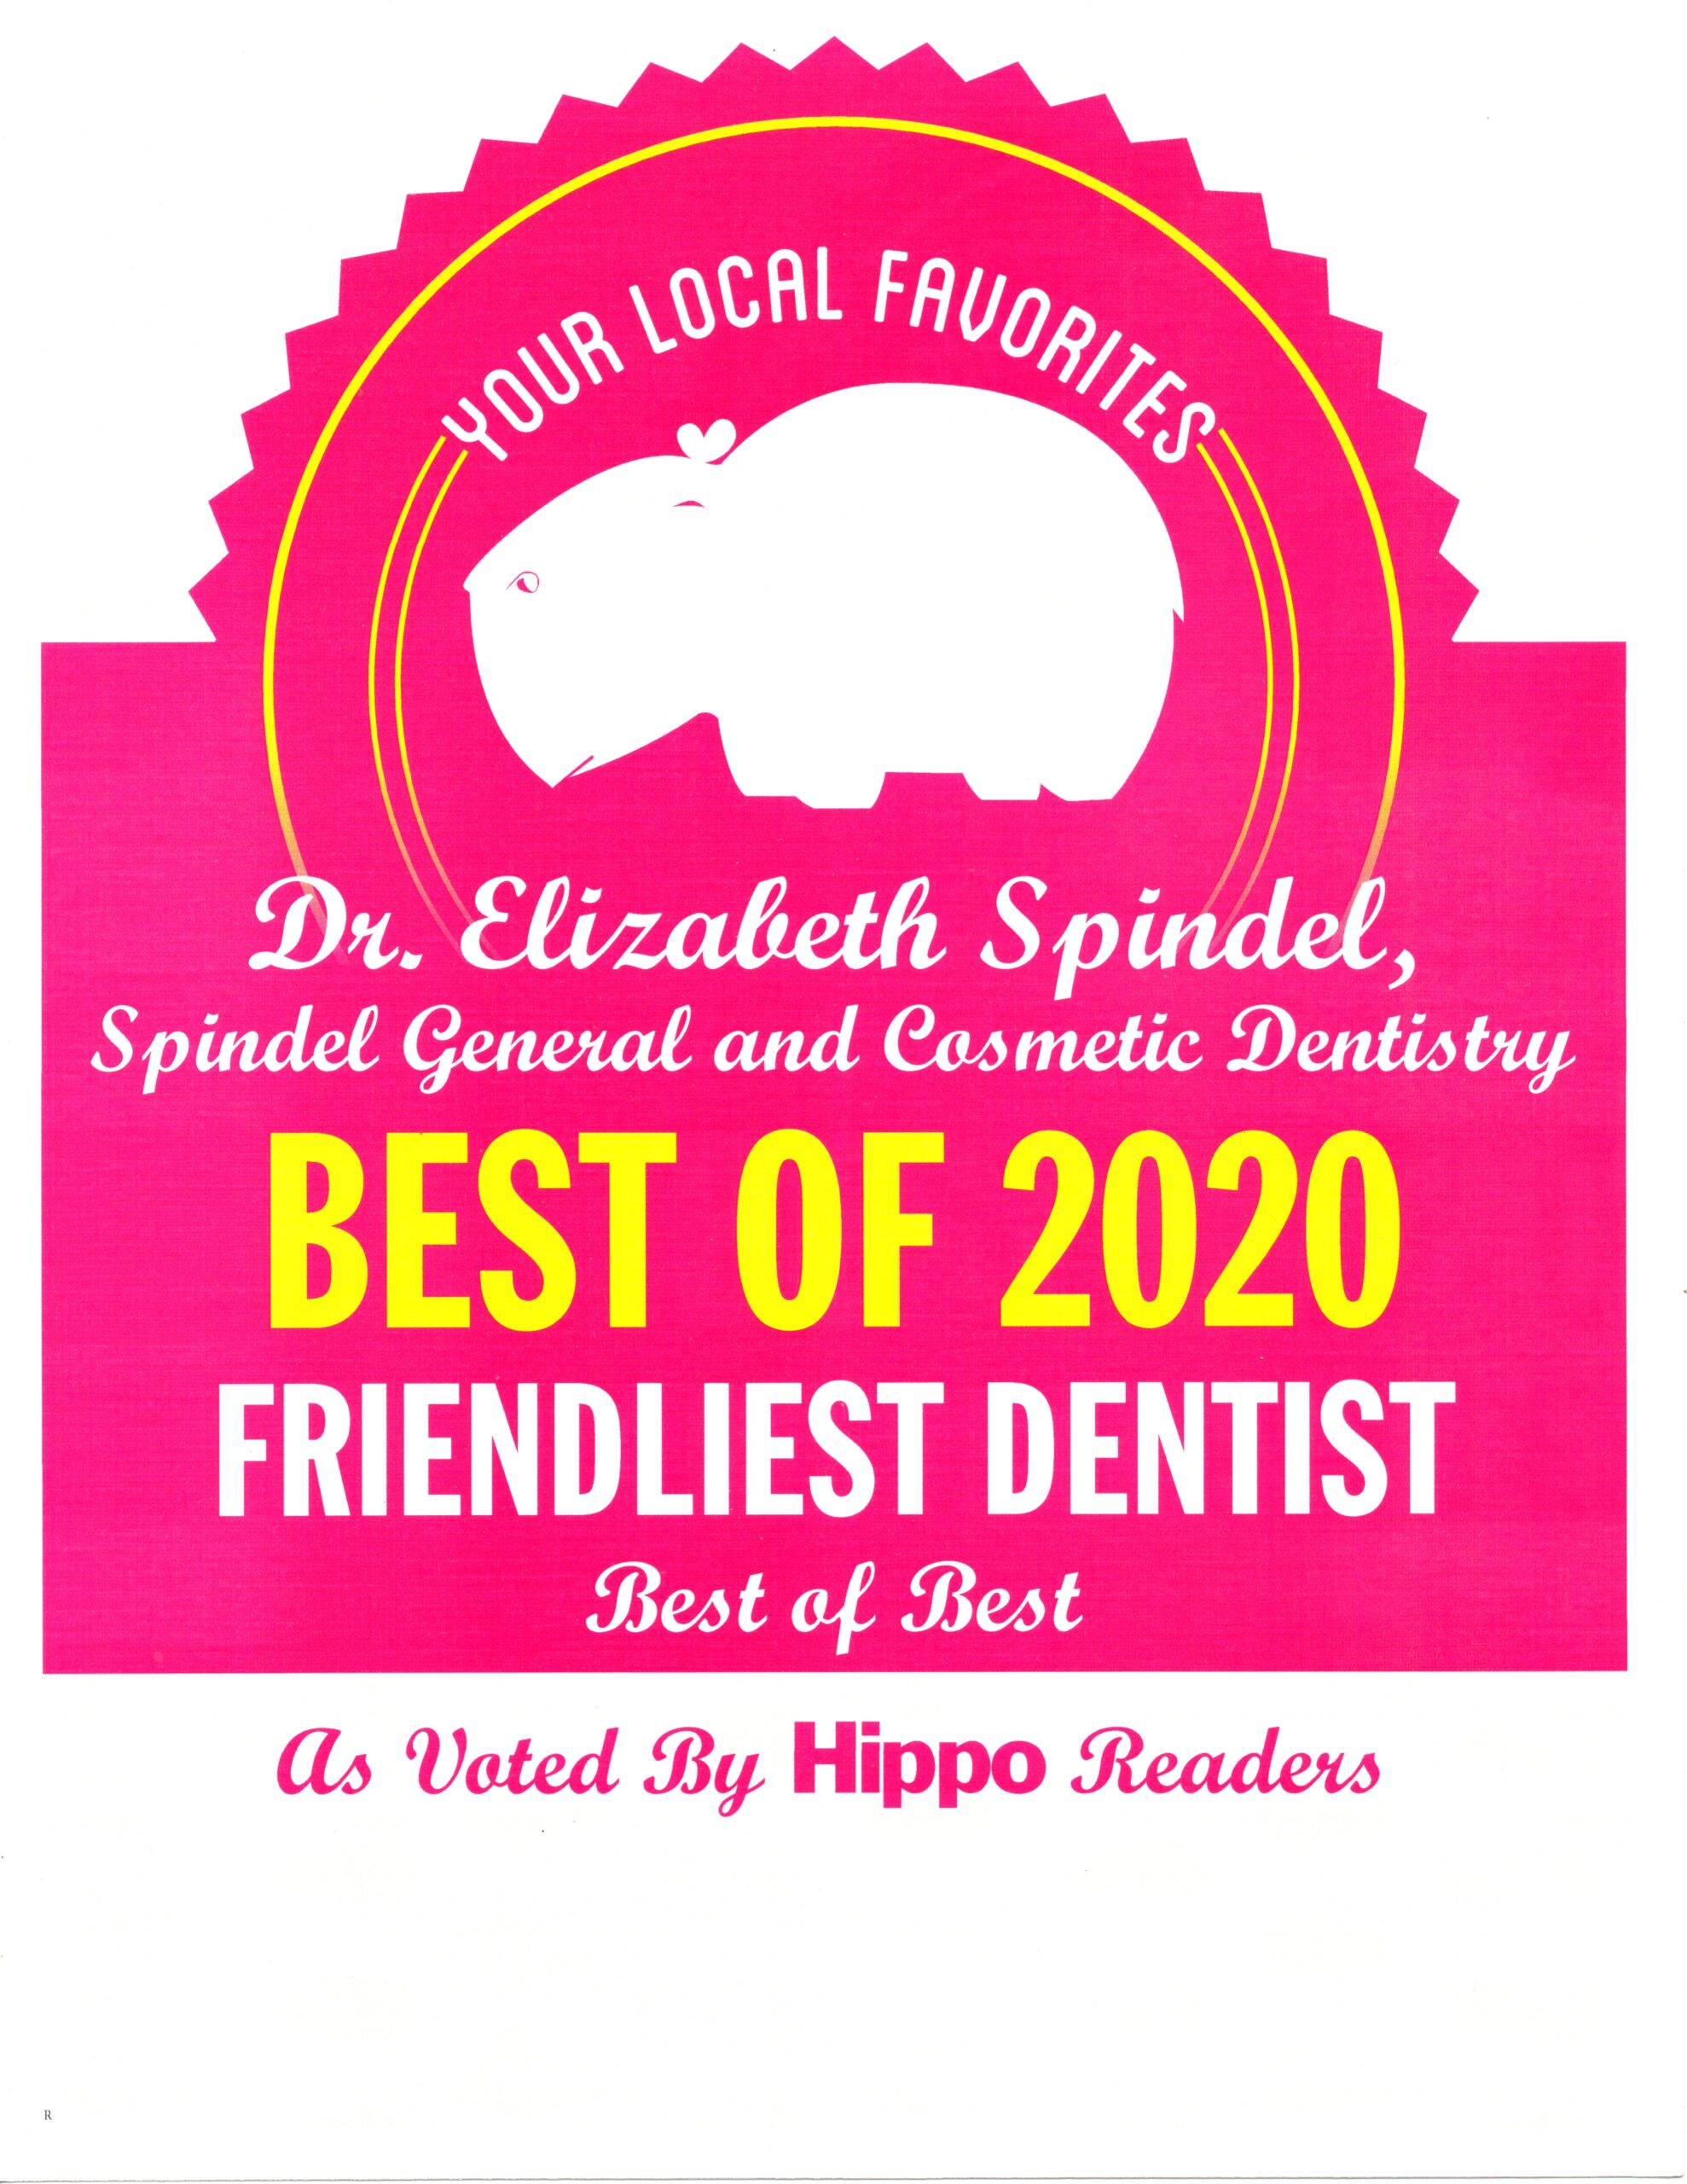 best of 2020 Friendliest Dentist The Hippo award